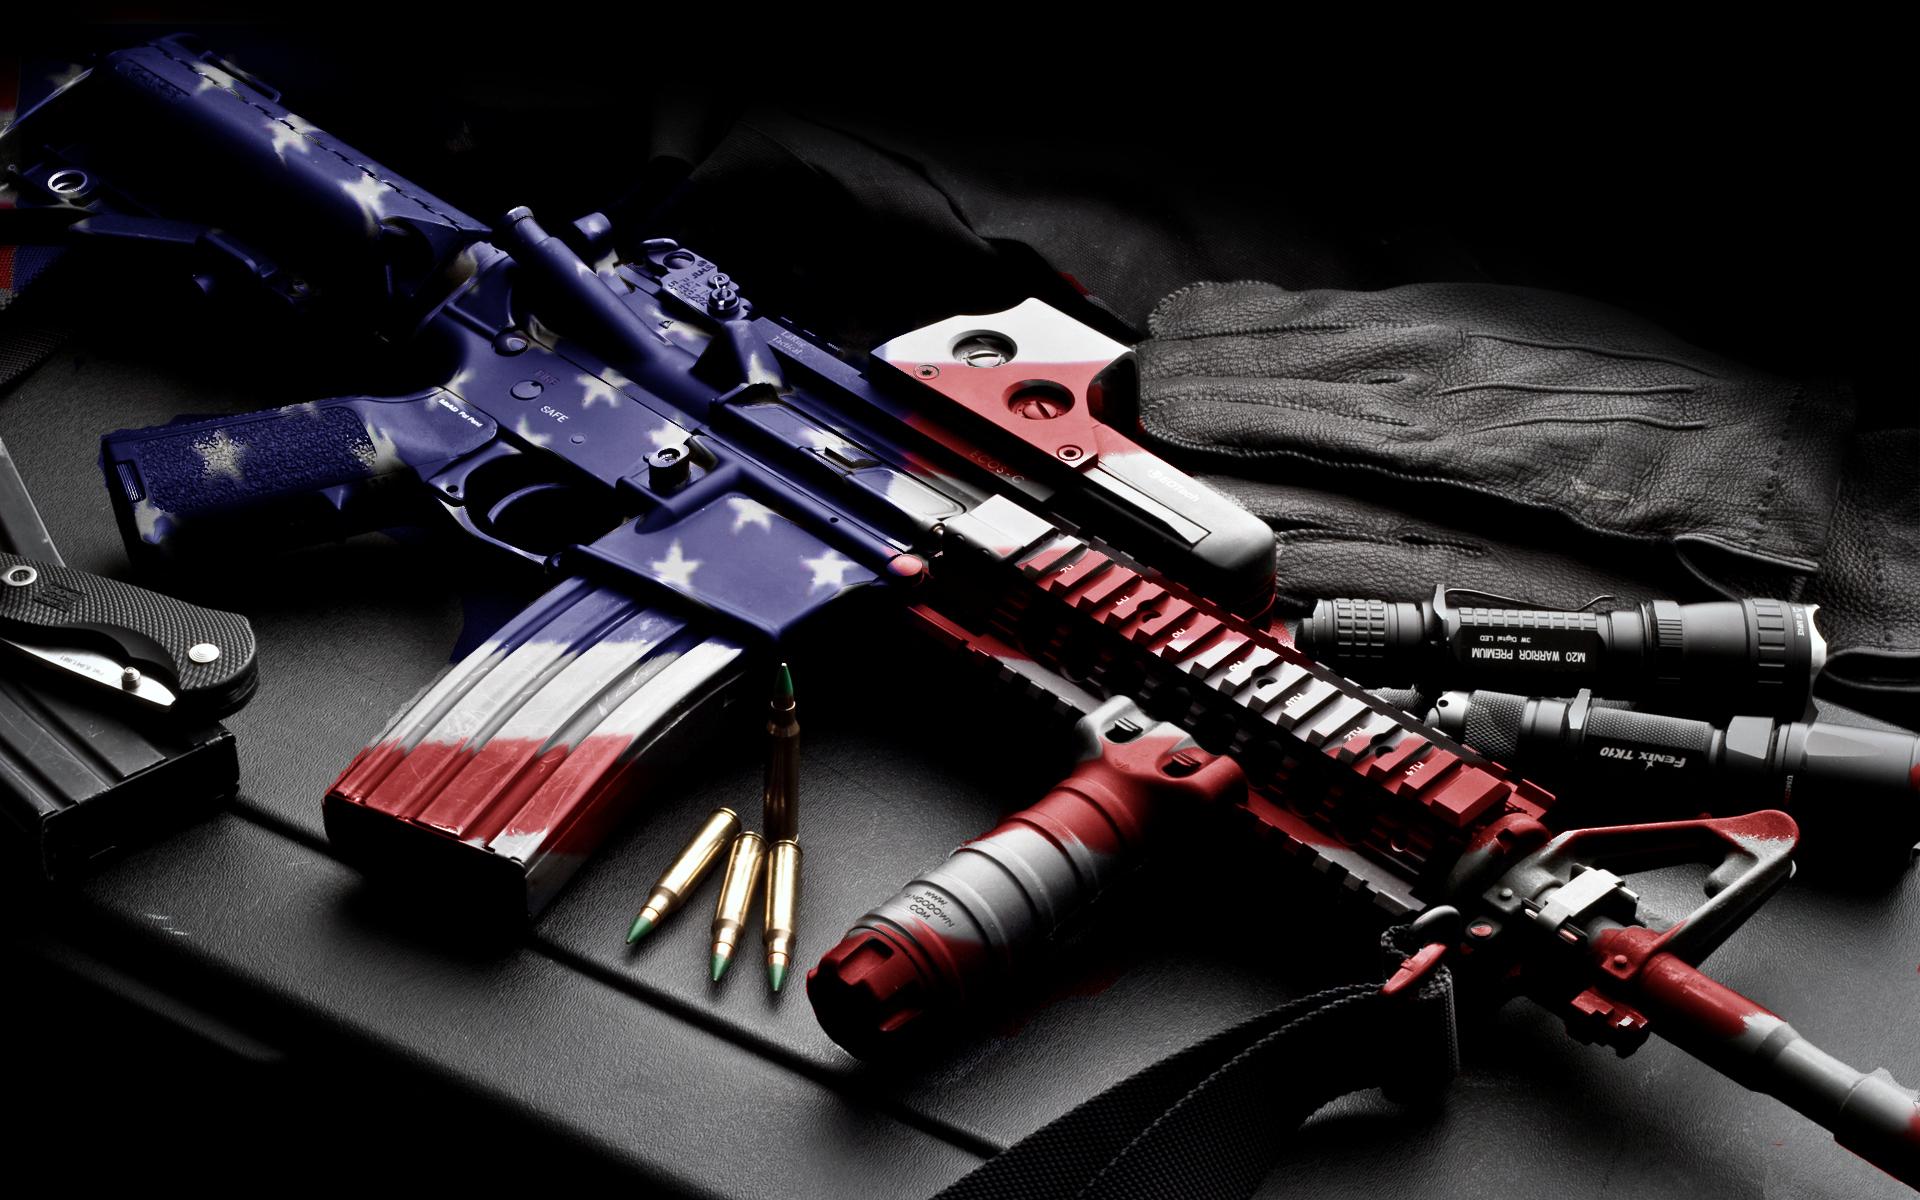 1920x1080 Rifle, Assault, Soldier, <b>Ar-15</b>, Rifle, Weapons, <b>Bullet</b> ...